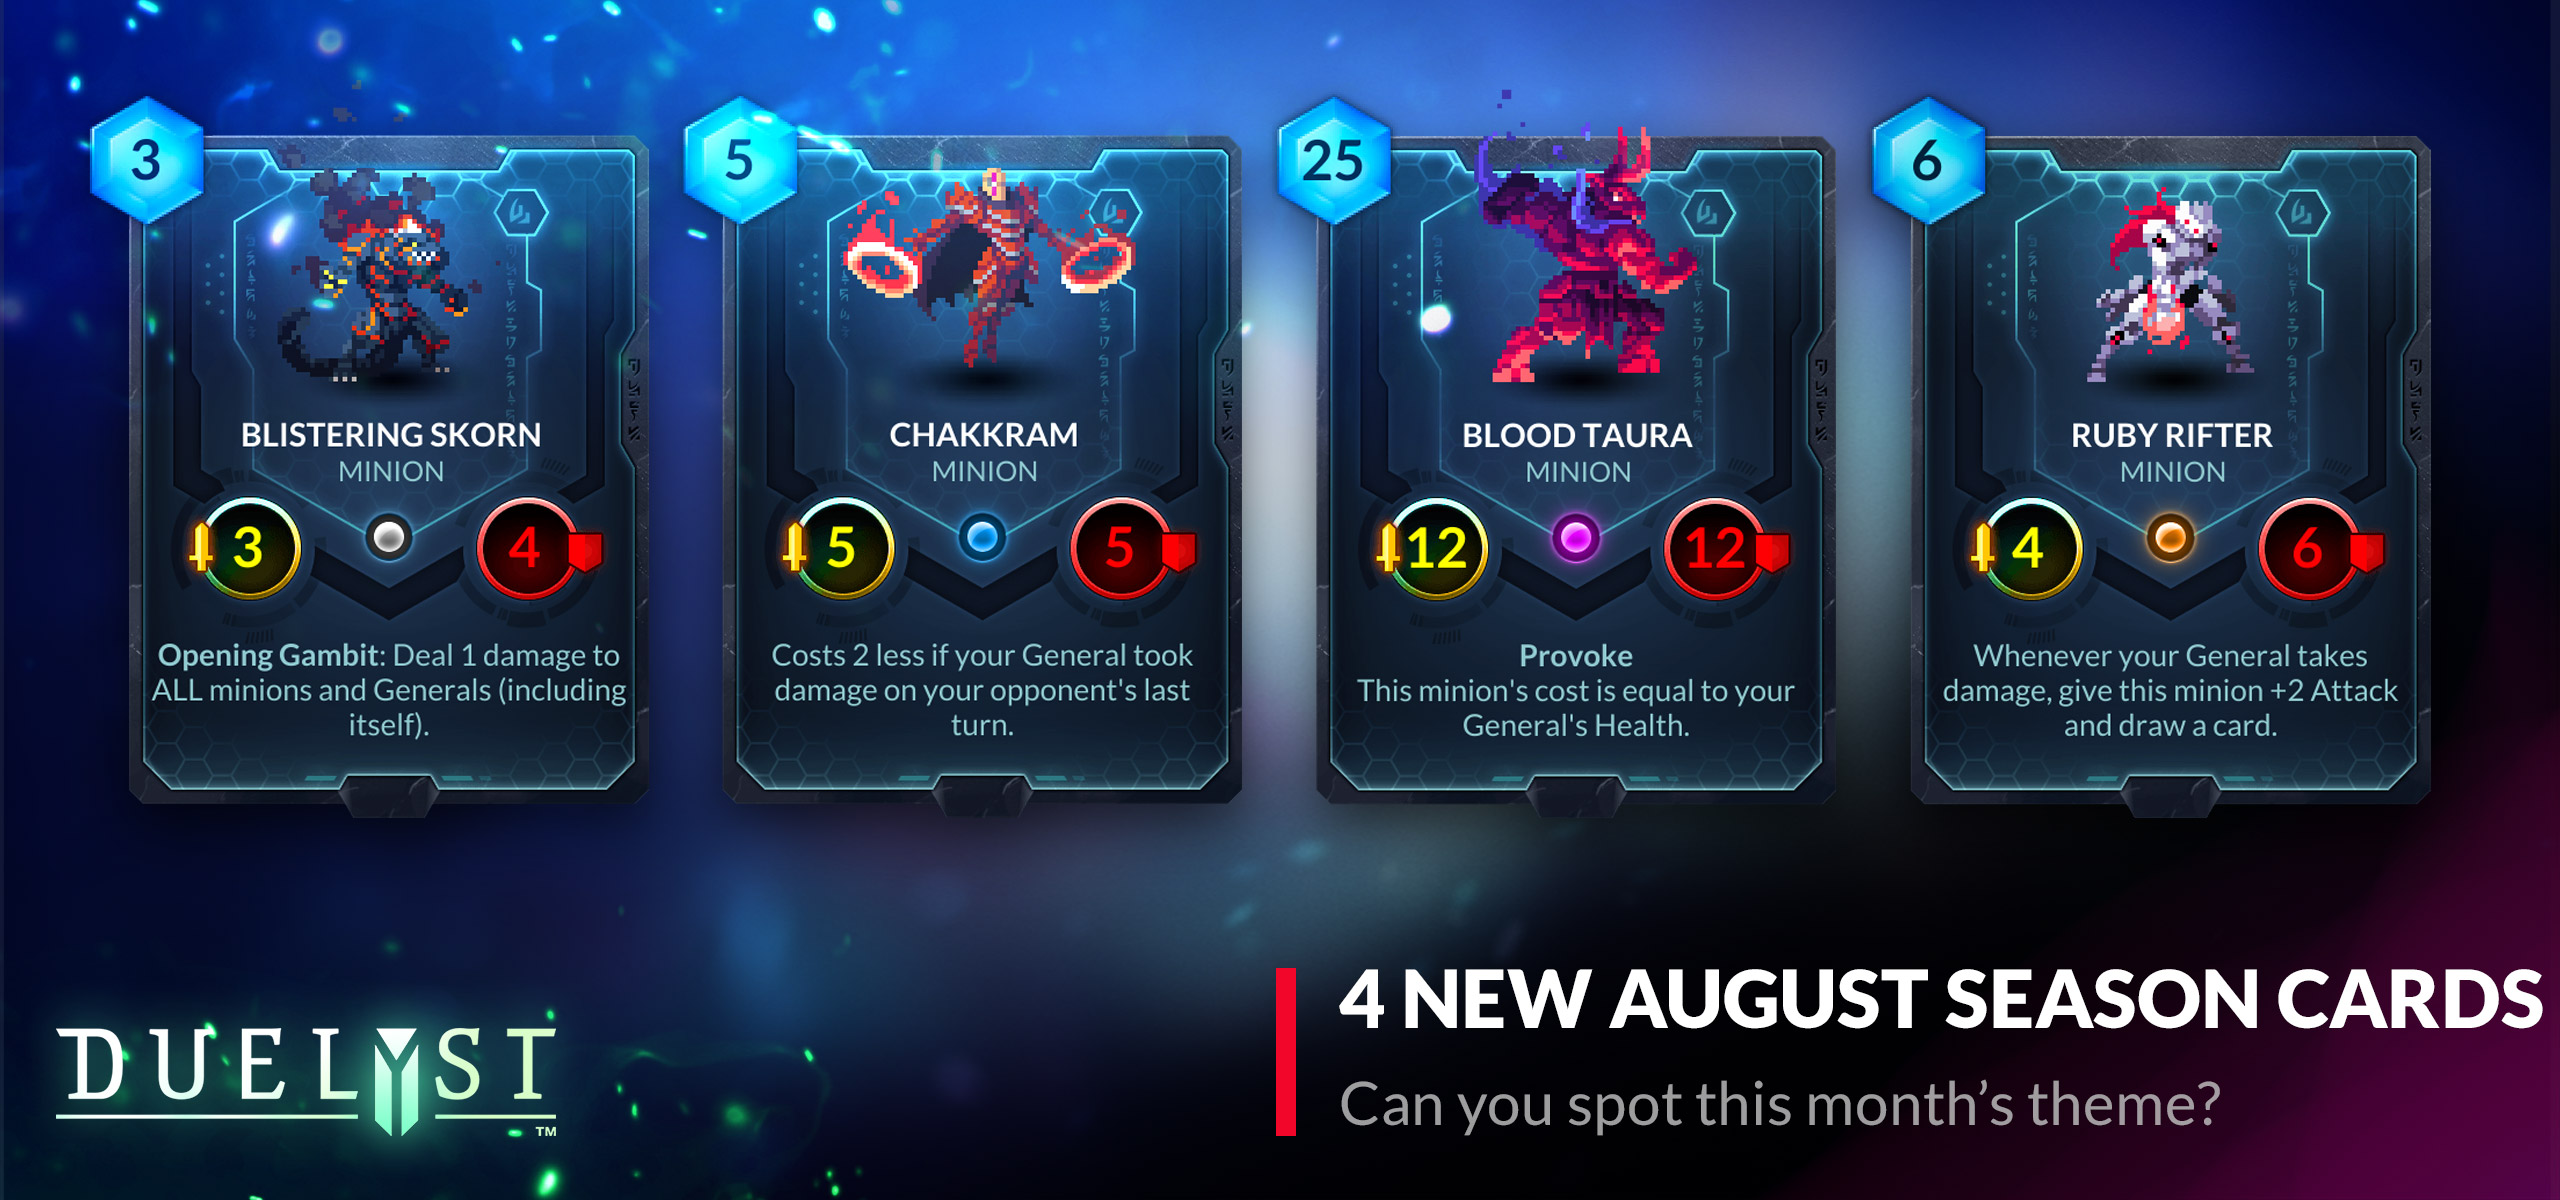 duelyst_august_season_cards